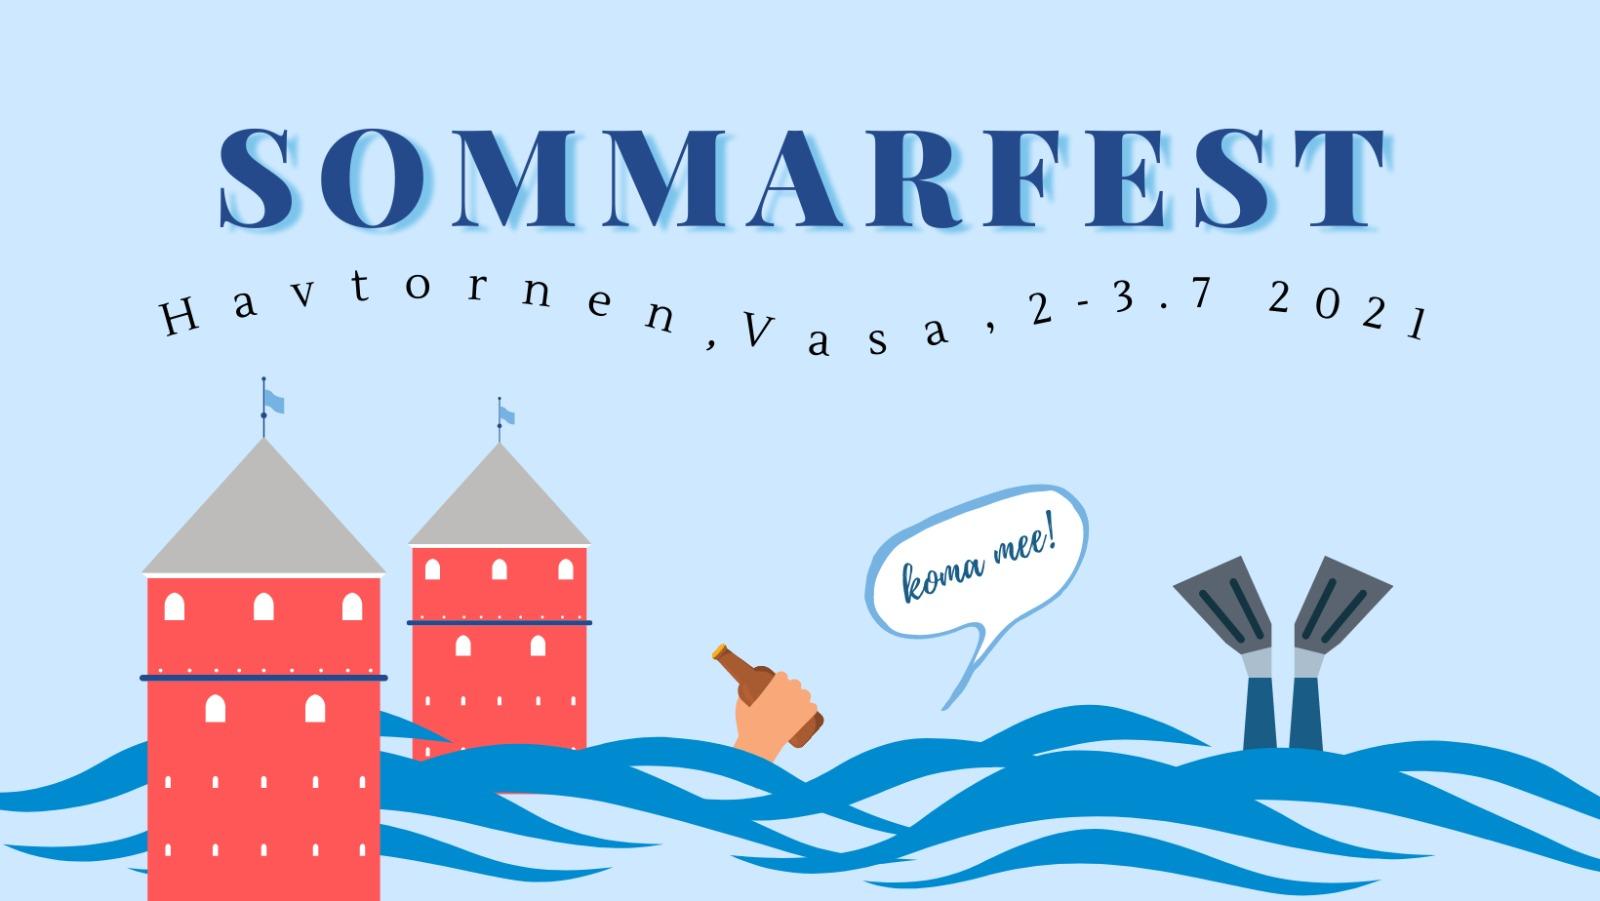 Vasa nation sommarfest 2021. Hålls på Havtornen i Vasa 2-3.7.2021